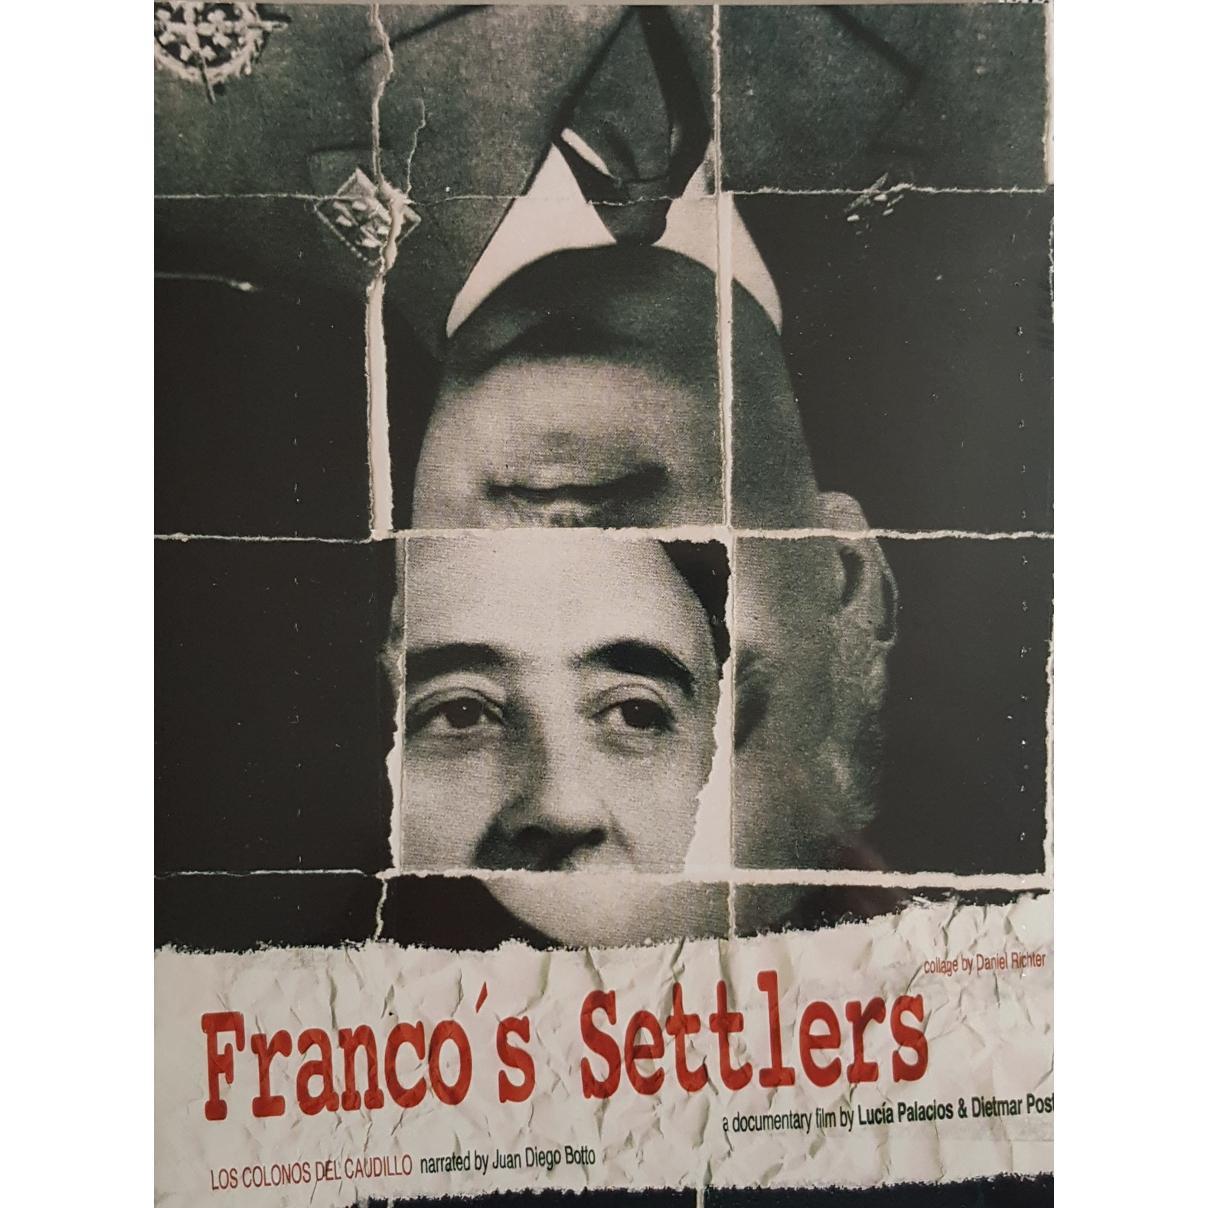 Los Colonos del Caudillo (Franco's Settlers)